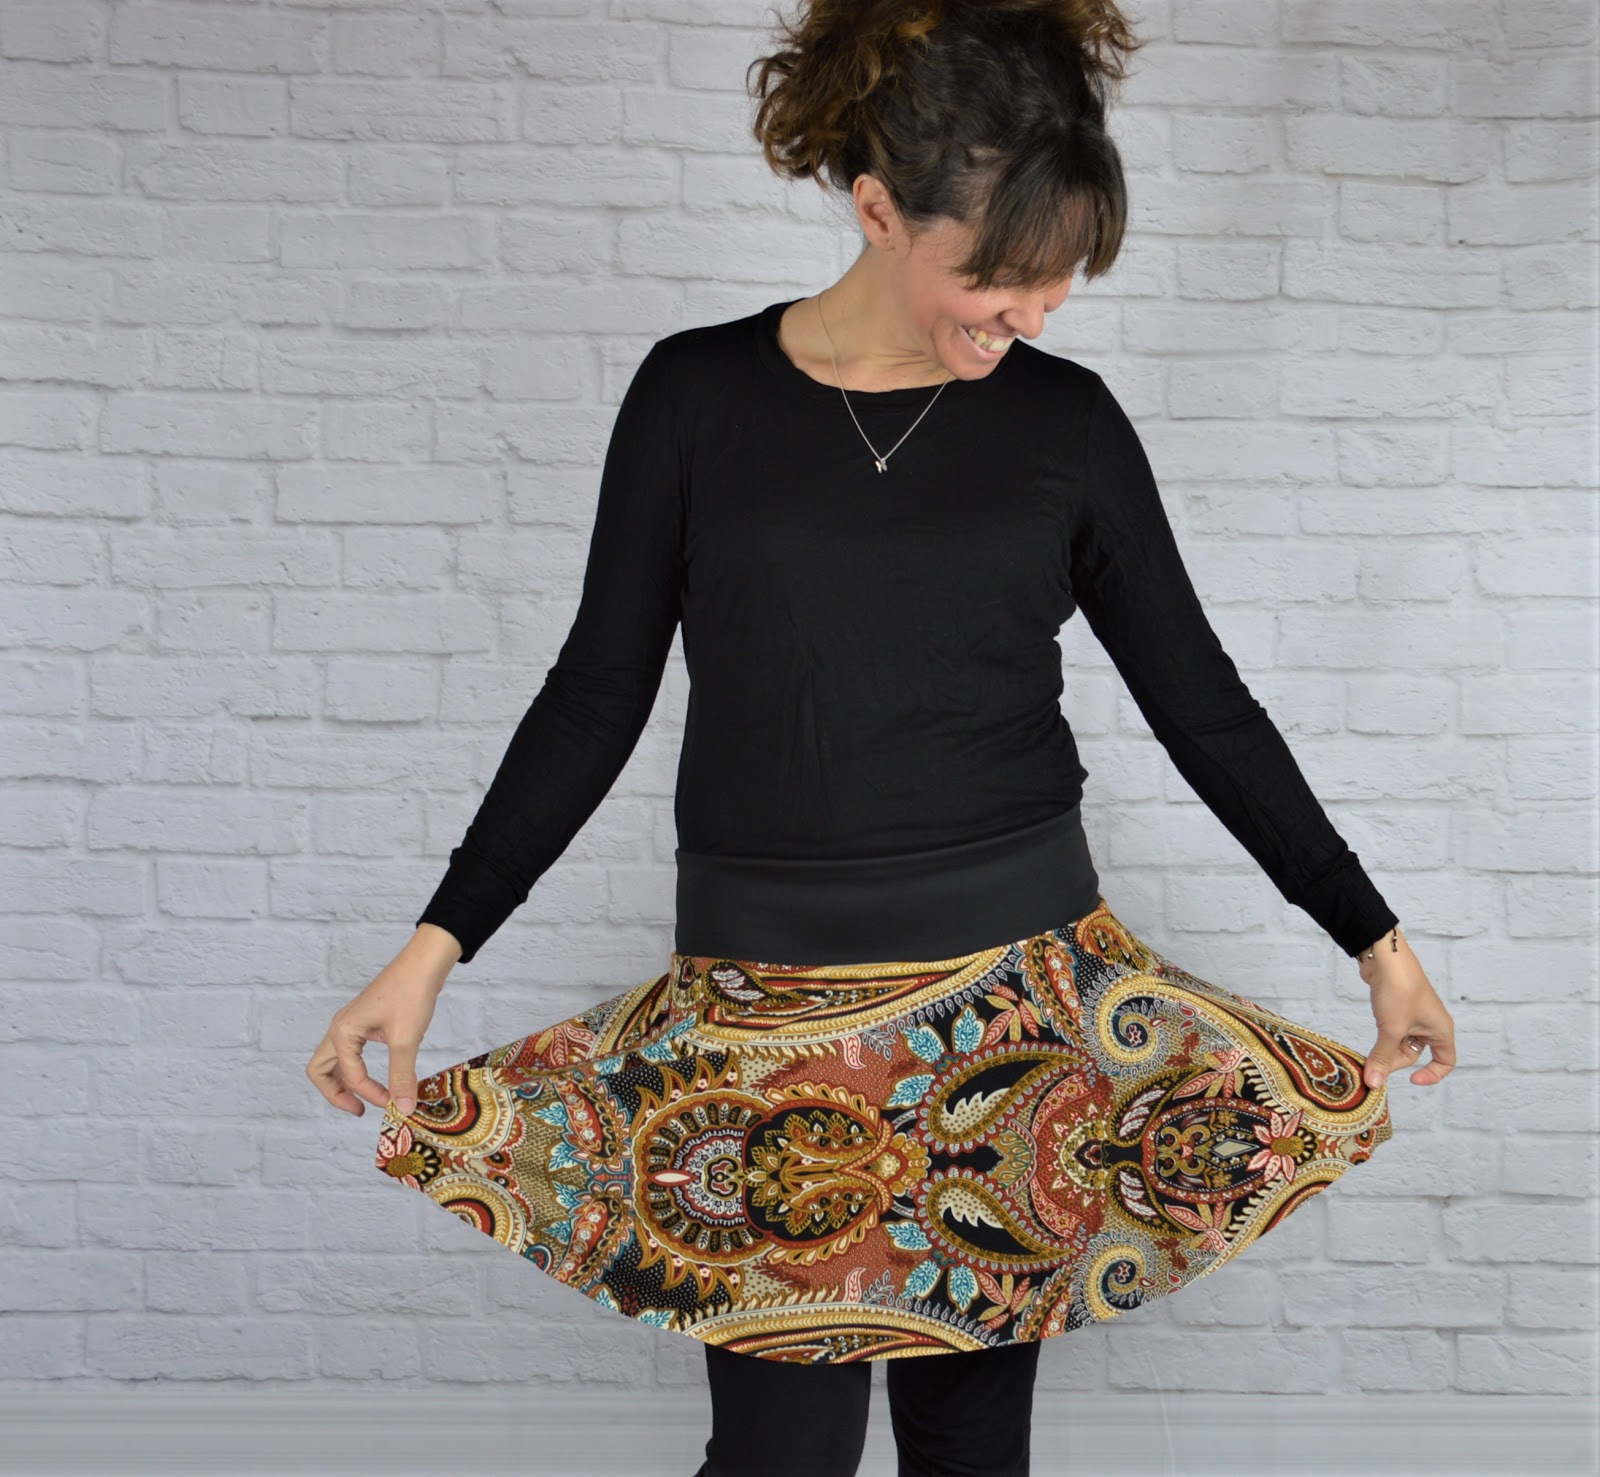 falda handmade mujer estampado étnico